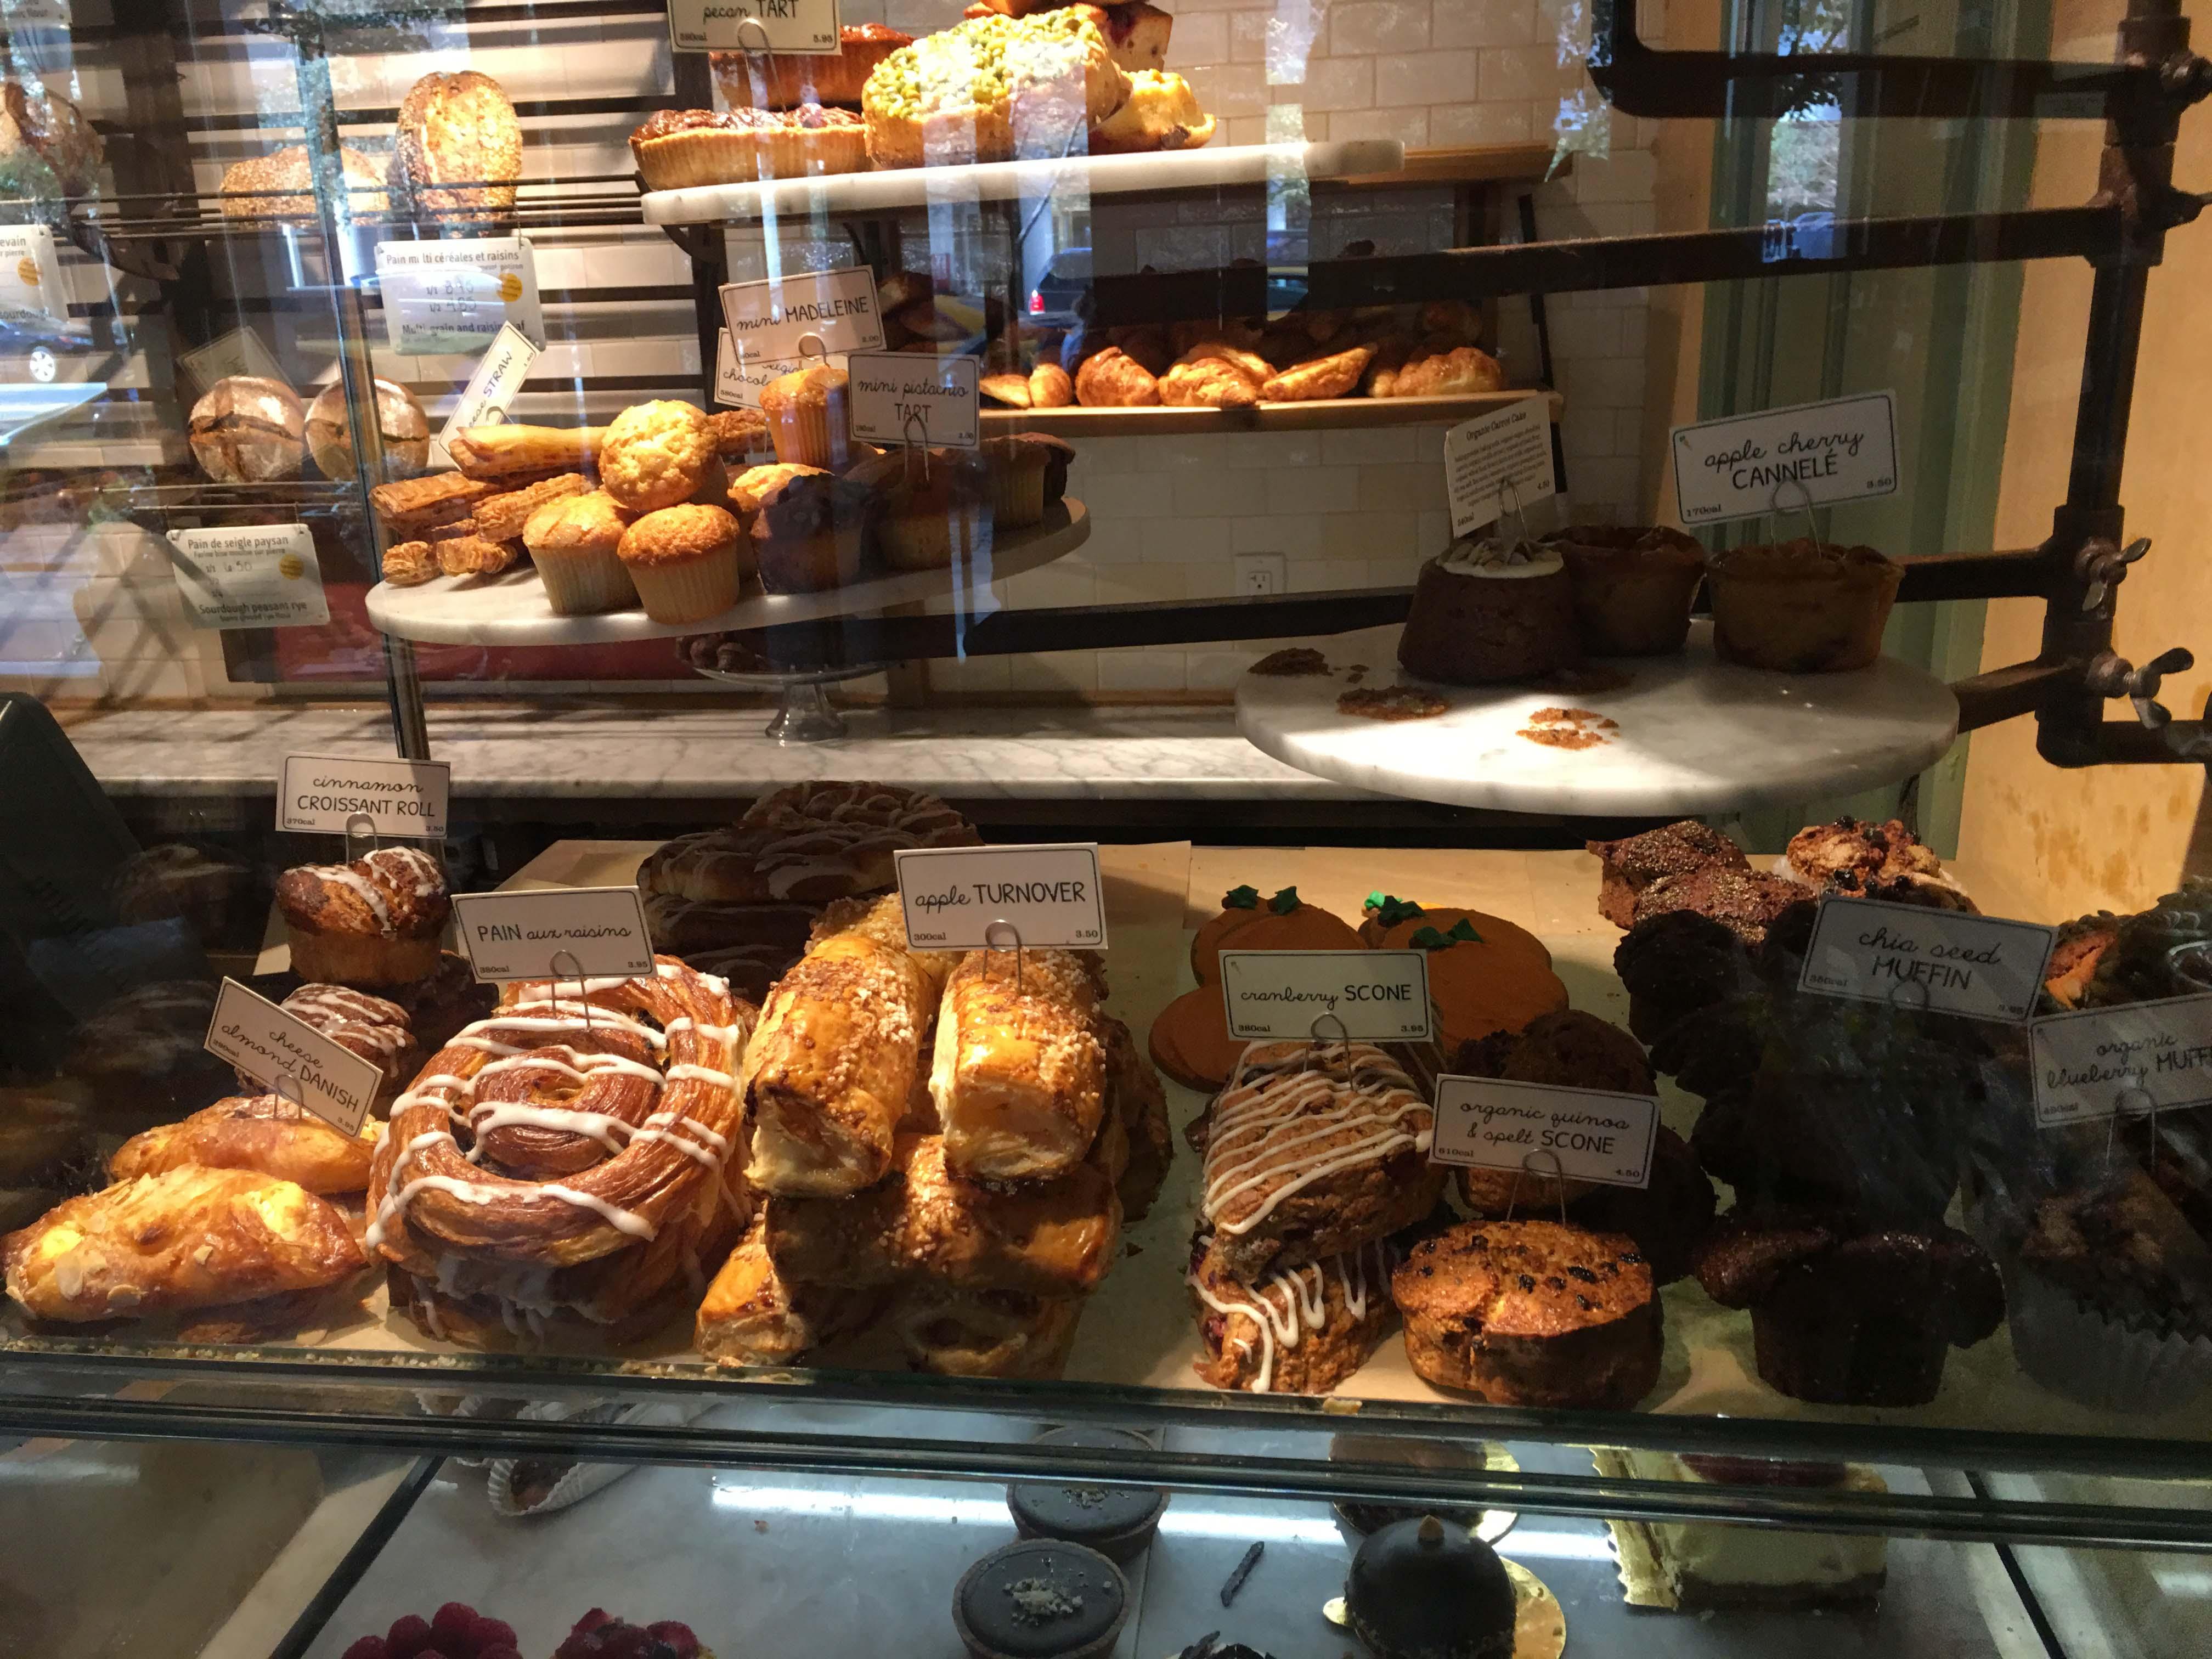 le-pain-quotidein-baked-goods